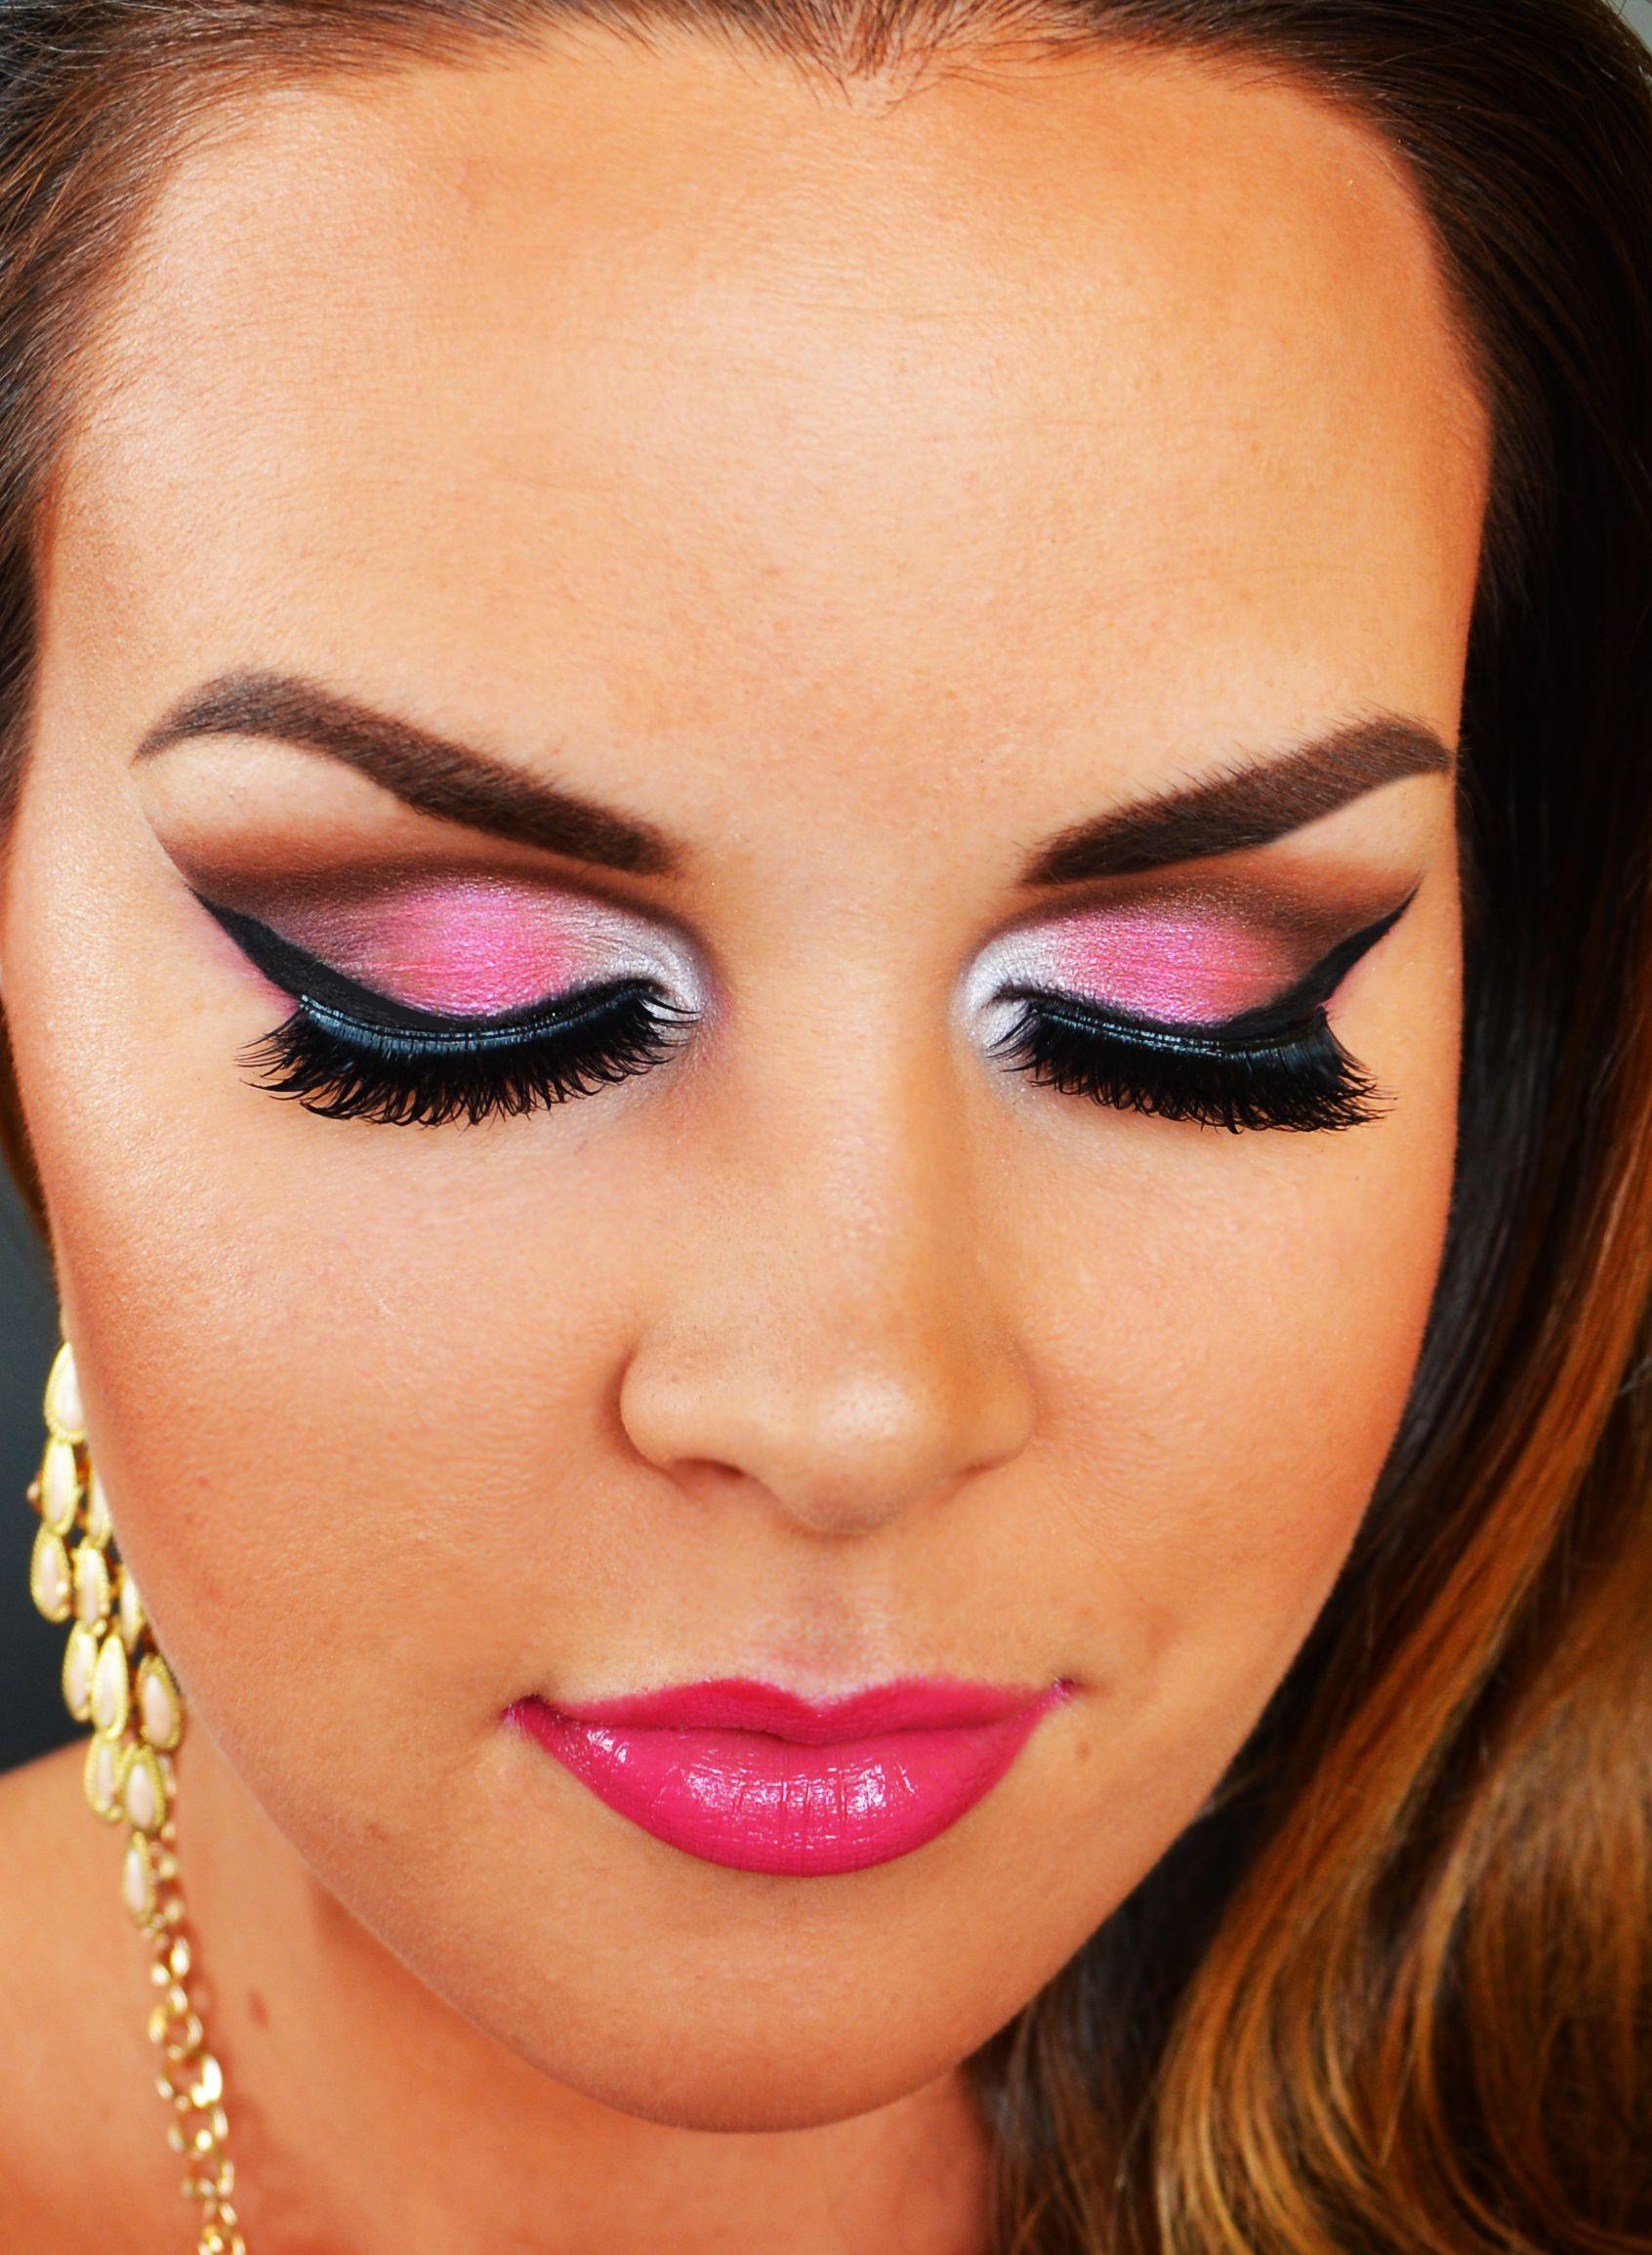 Pink Smoky Wings using Makeup Geek Eyeshadows Pink